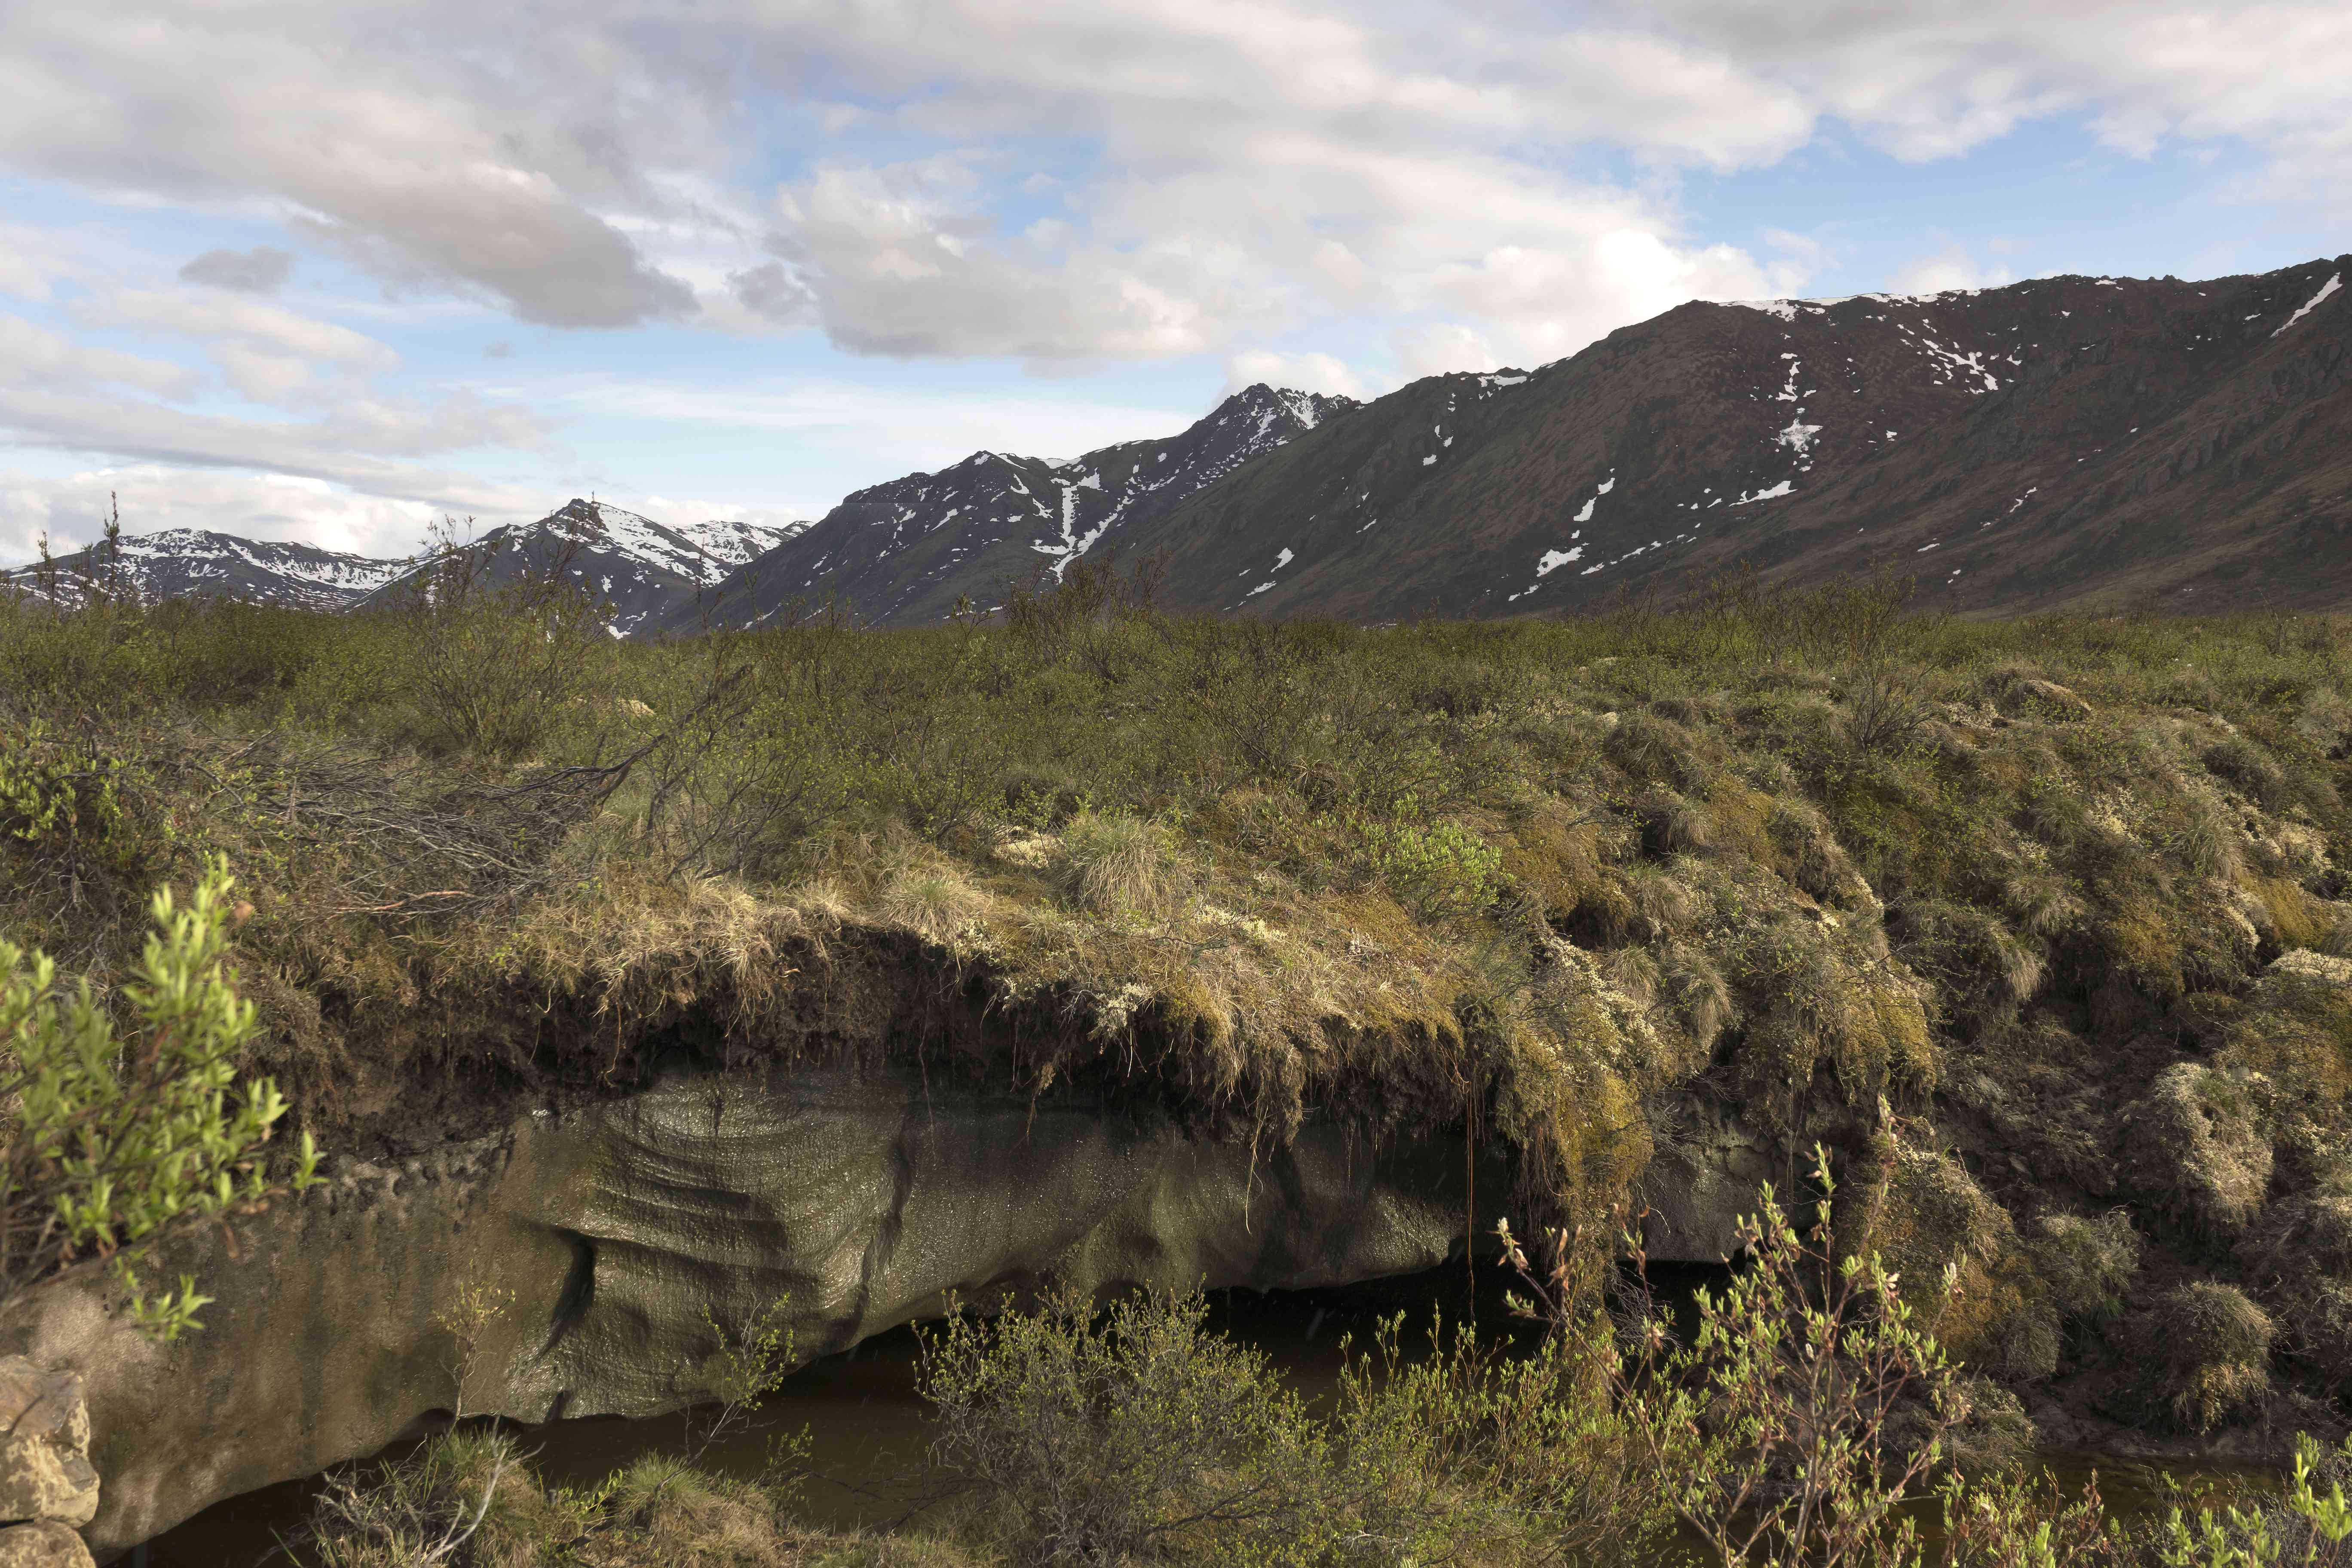 Melting Ice permafrost near Dempster Highway subarctic tundra Tombstone Territorial Park Yukon